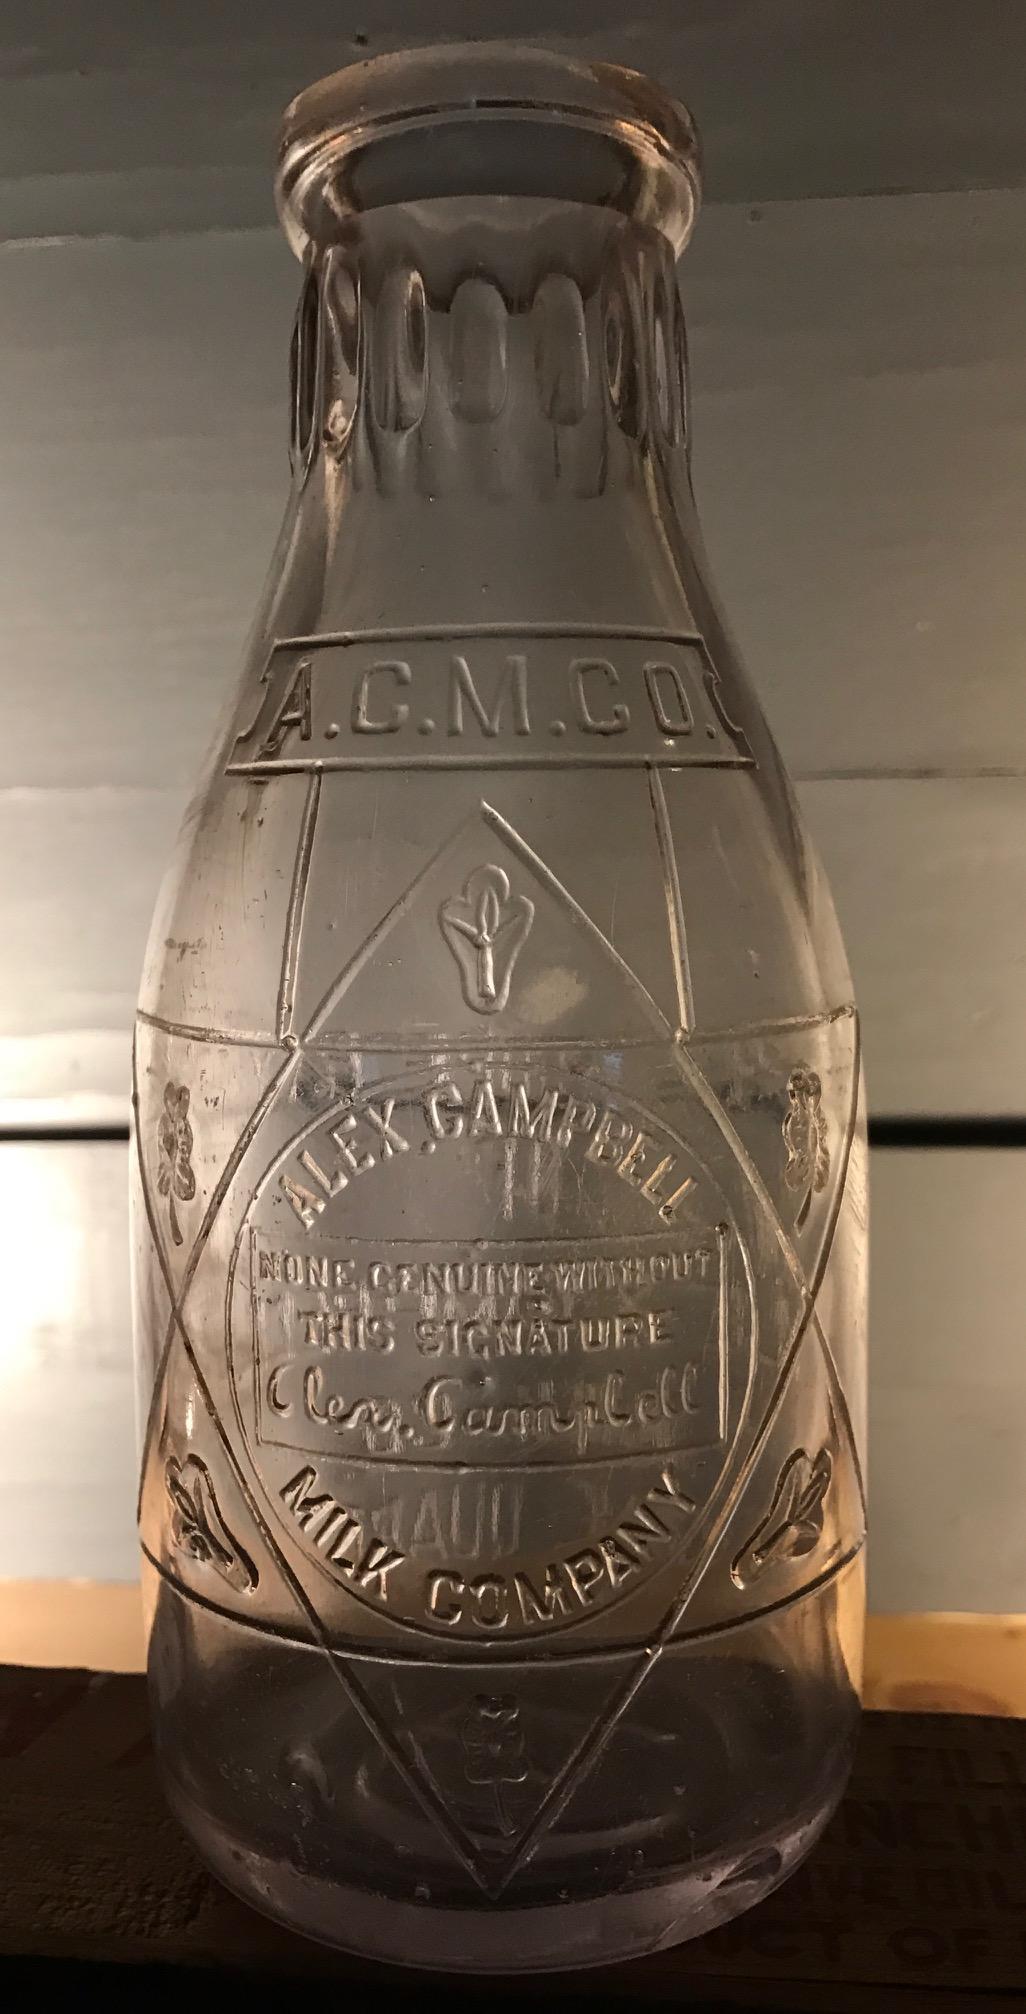 Alex Campbell Milk Company – Bay Bottles